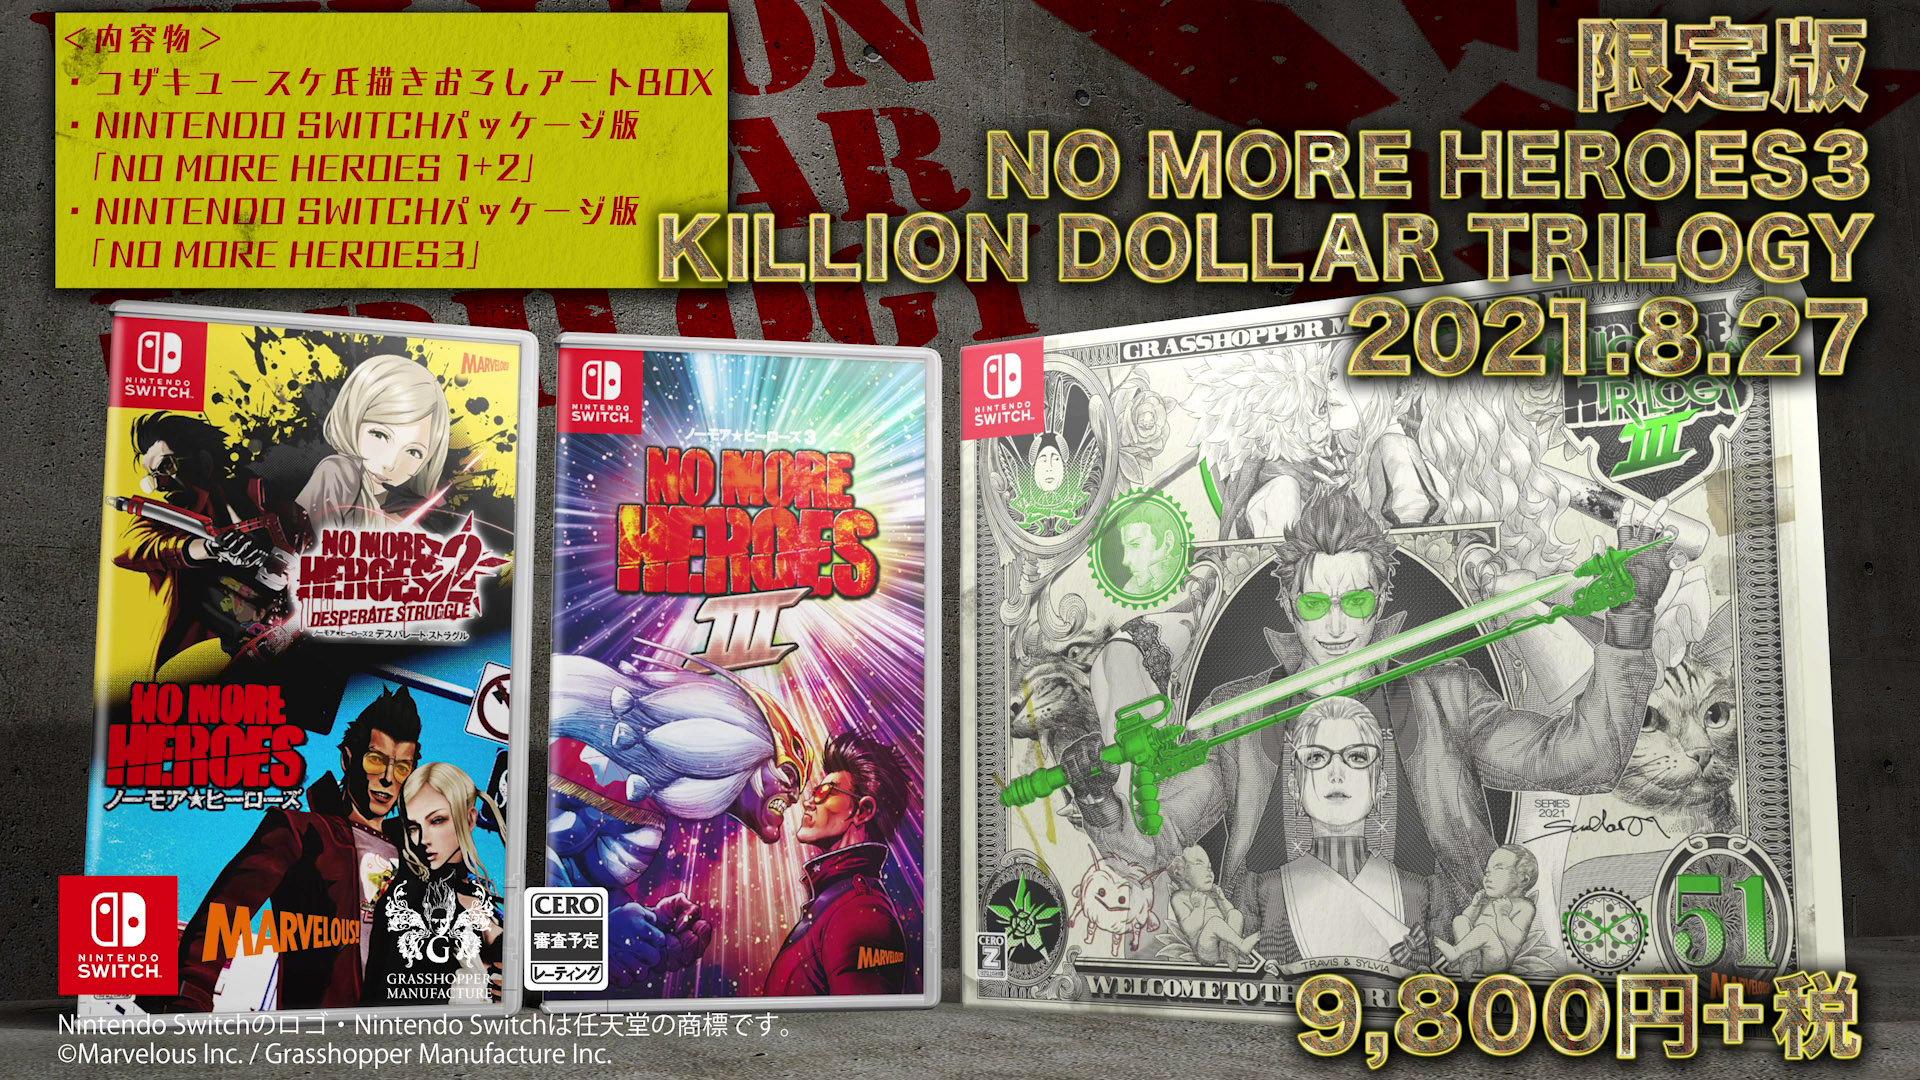 NMH-Killion-Dollar-Trilogy_04-08-21.jpg